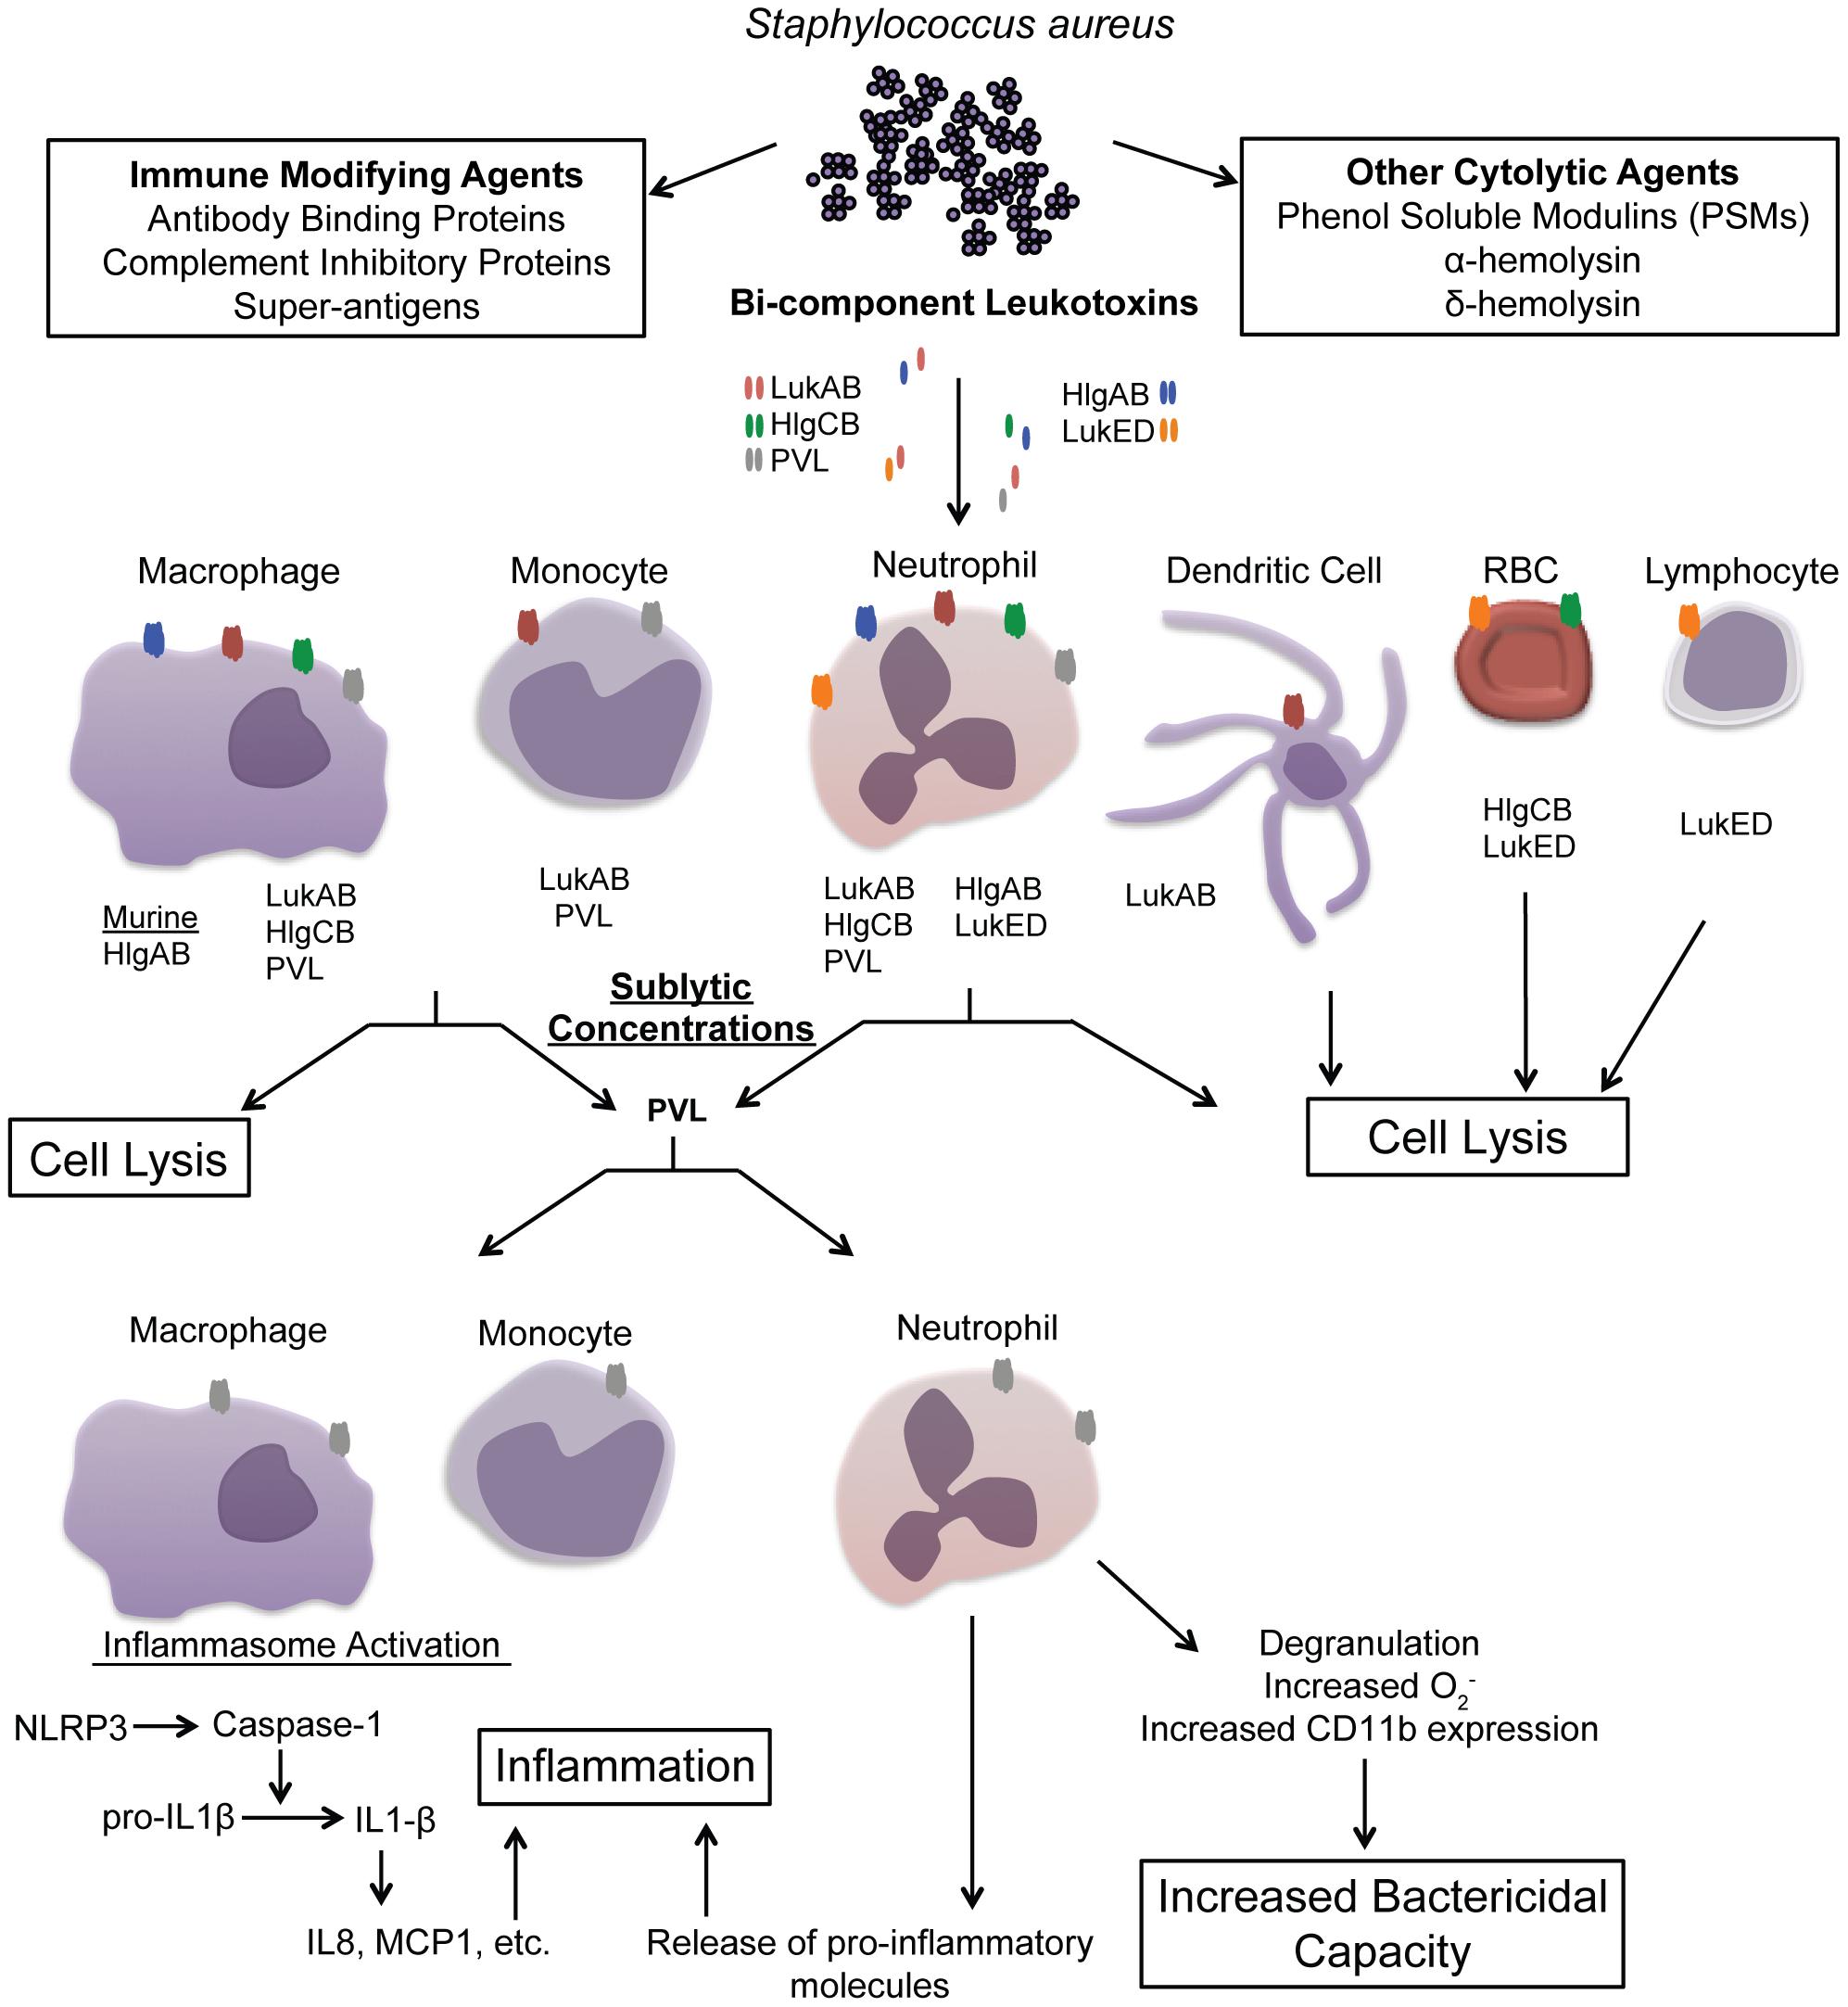 Overview of <i>S. aureus</i> leukotoxin action on host immune cells.